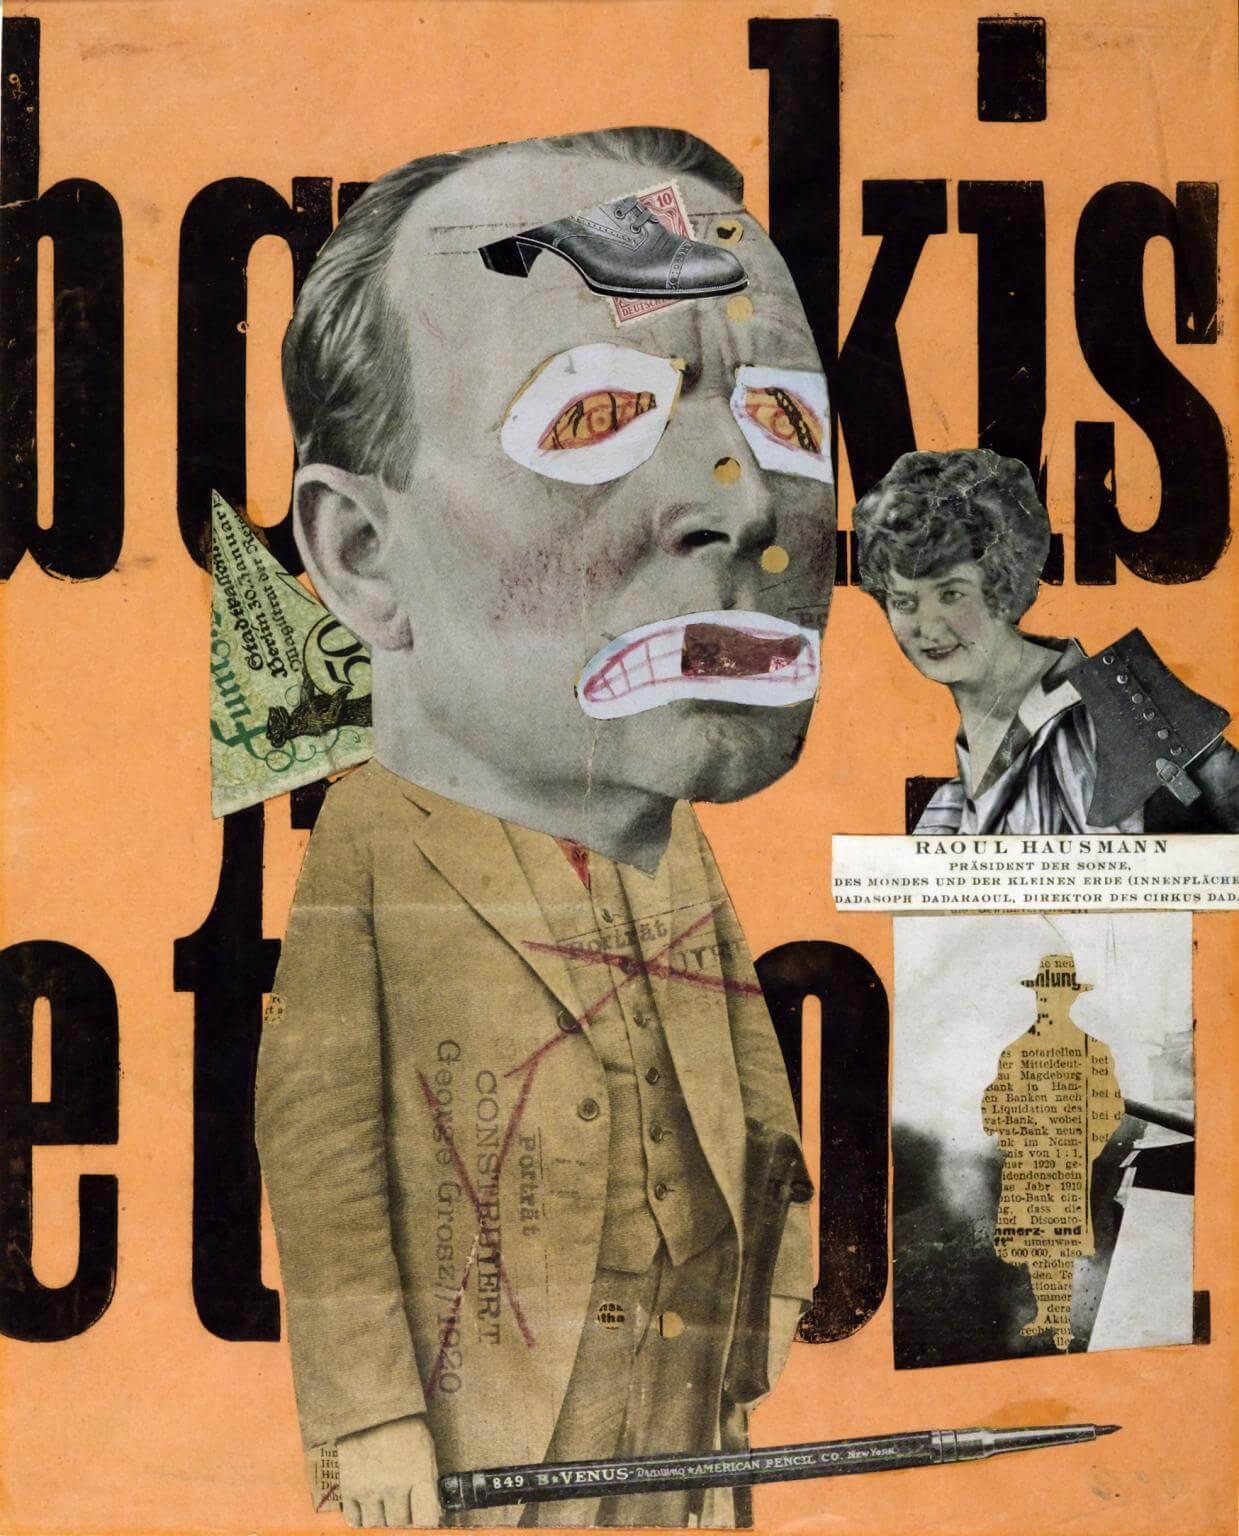 El crítico de arte 1919-20 - Raoul Hausmann 1886-1971 - Dadaismo